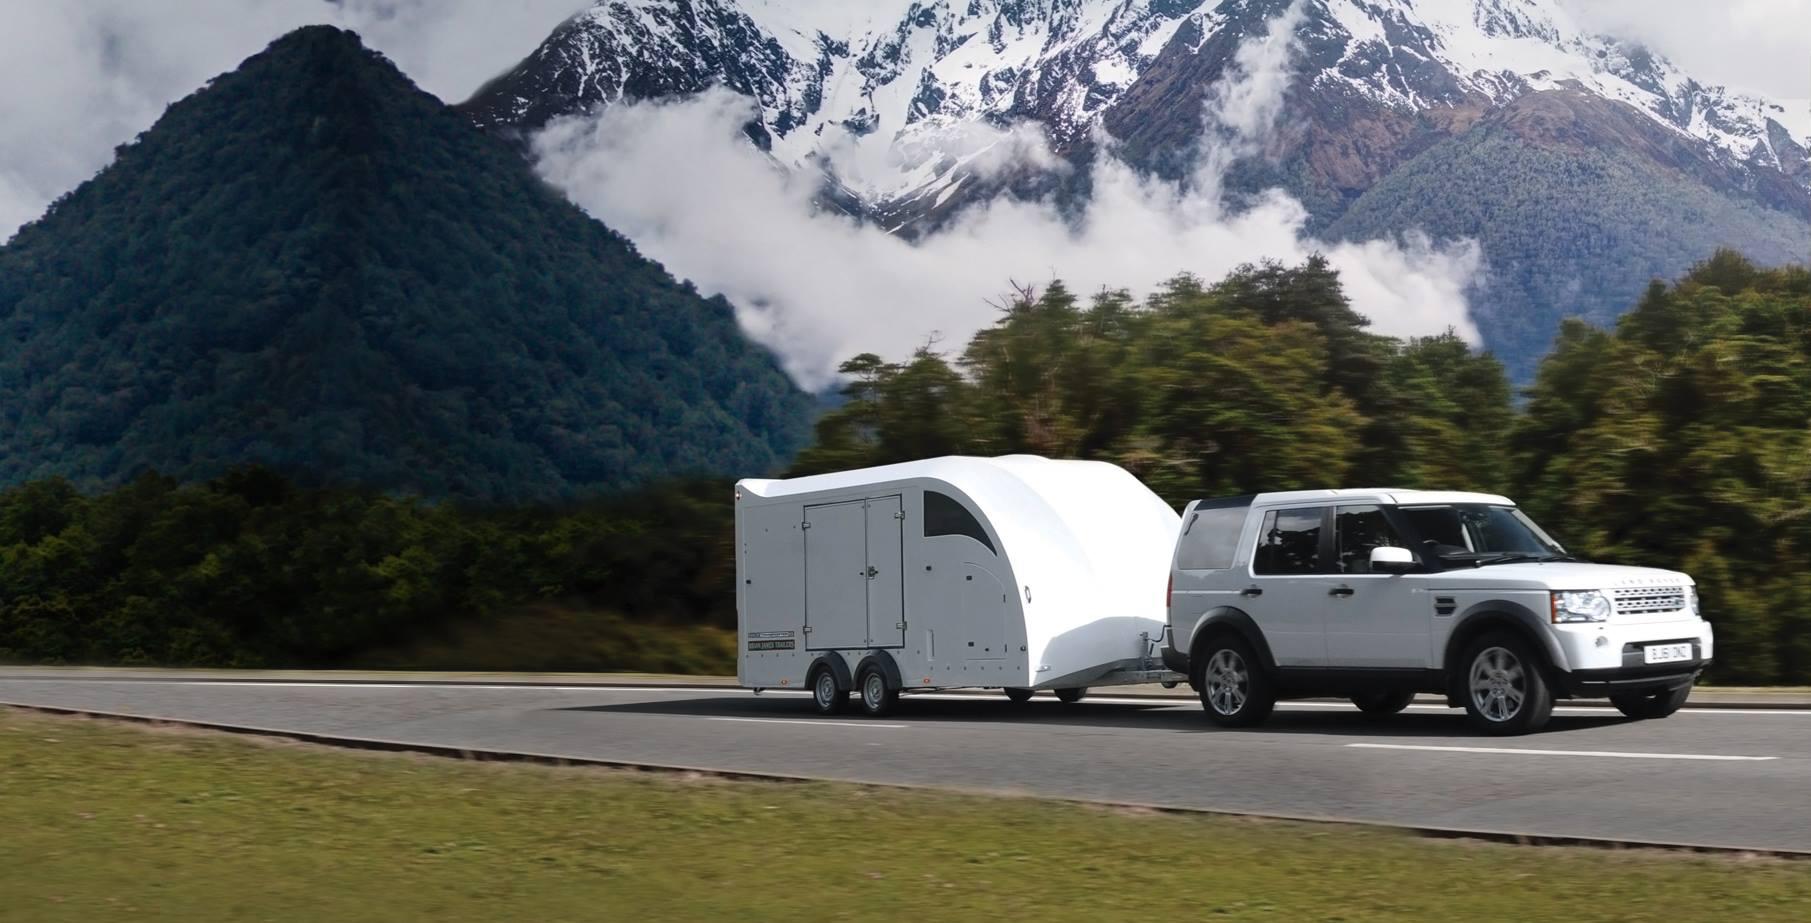 enclosed transport trailer for cars